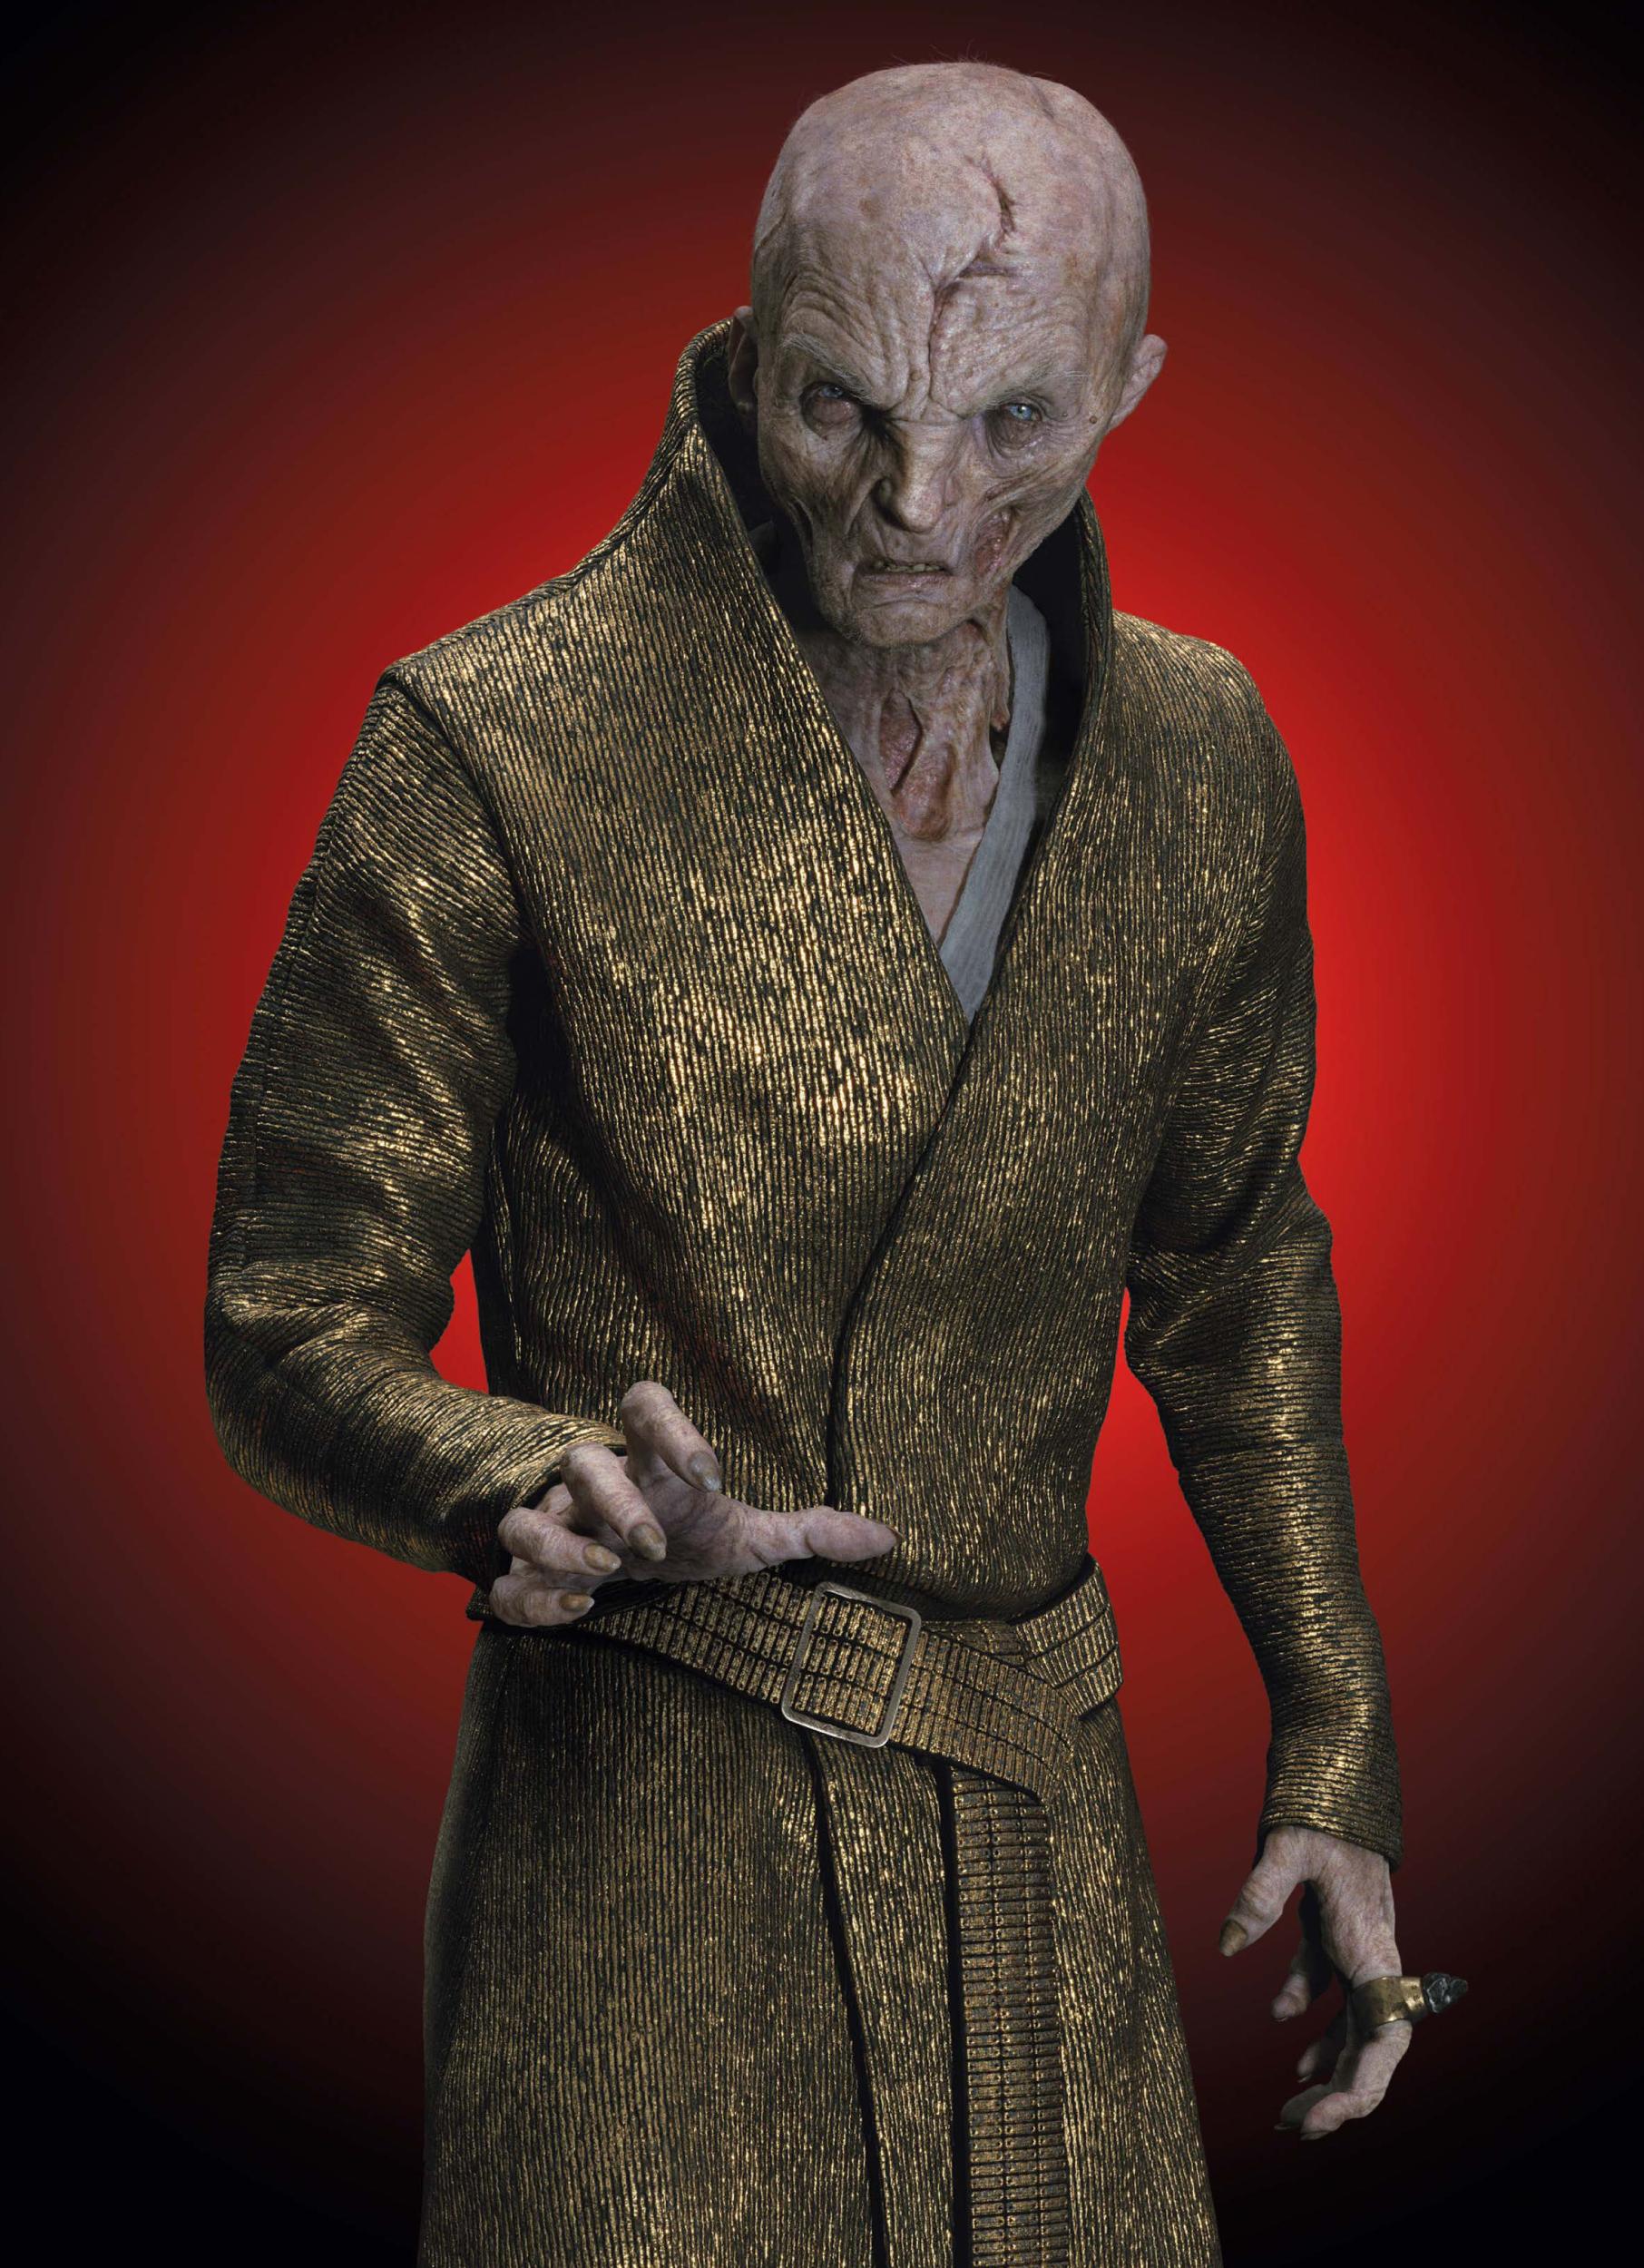 Supreme Leader Snoke Villains Wiki Fandom Powered By Wikia